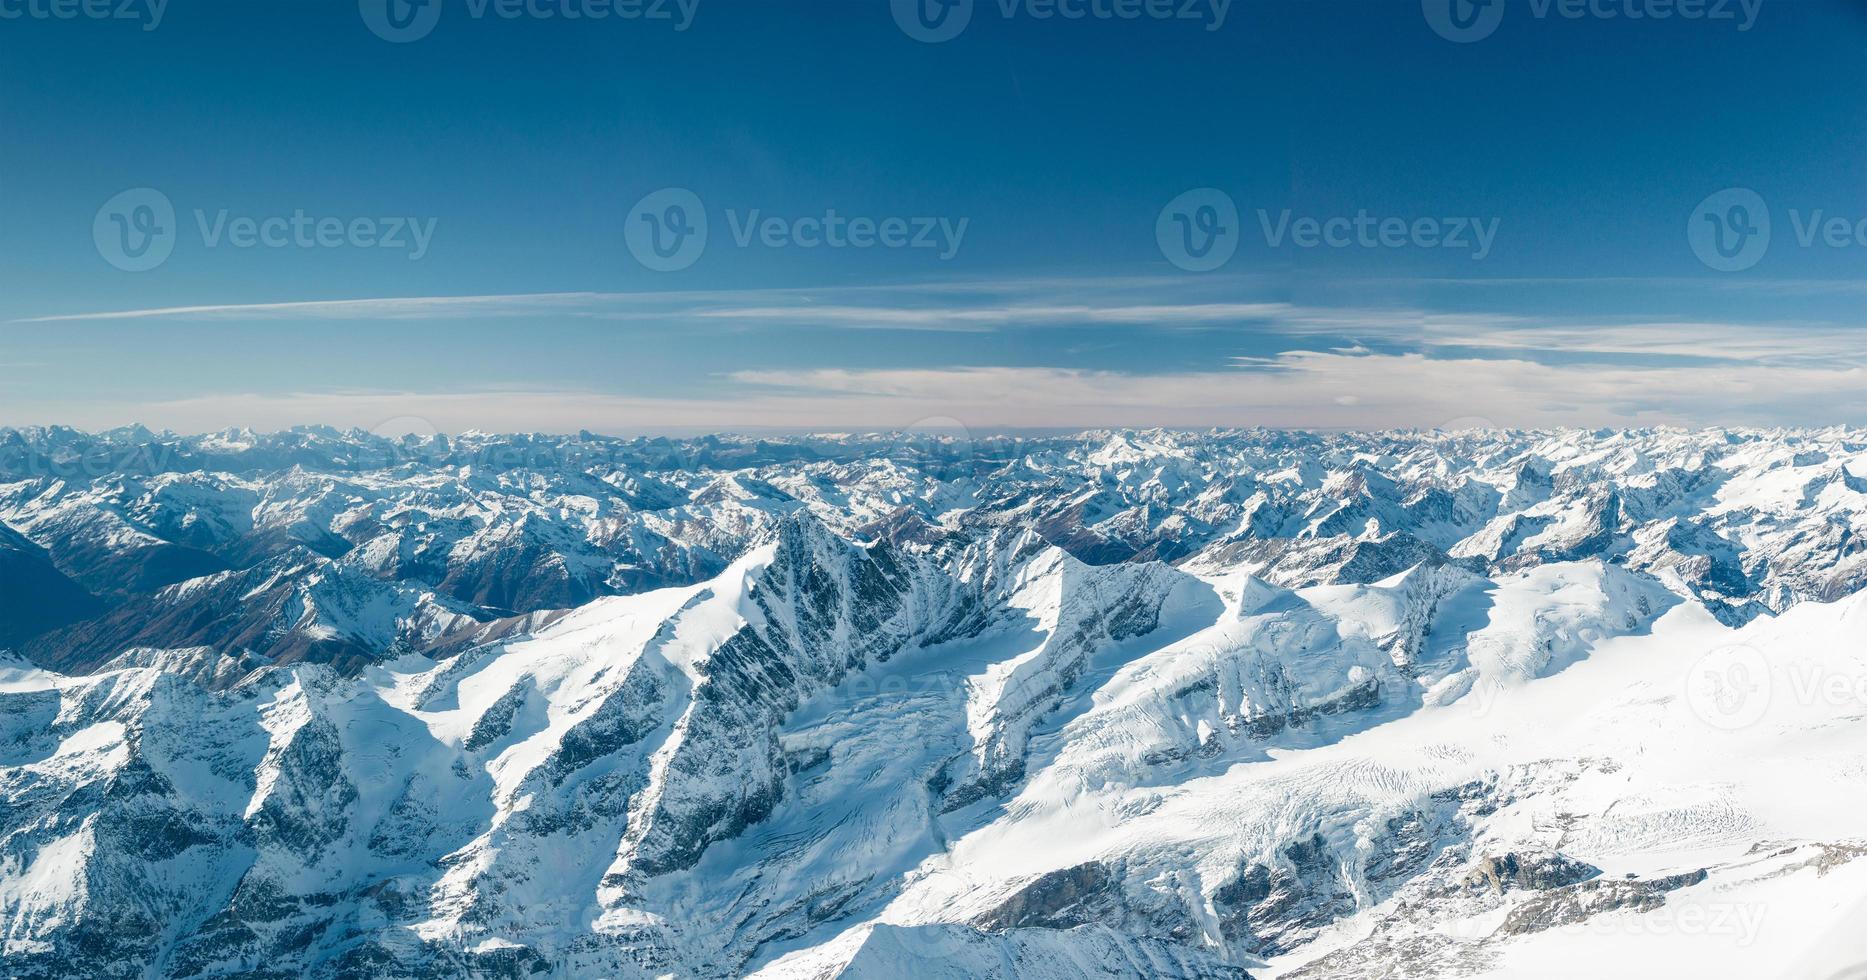 cime innevate nel freddo Tirolo Austria in inverno foto